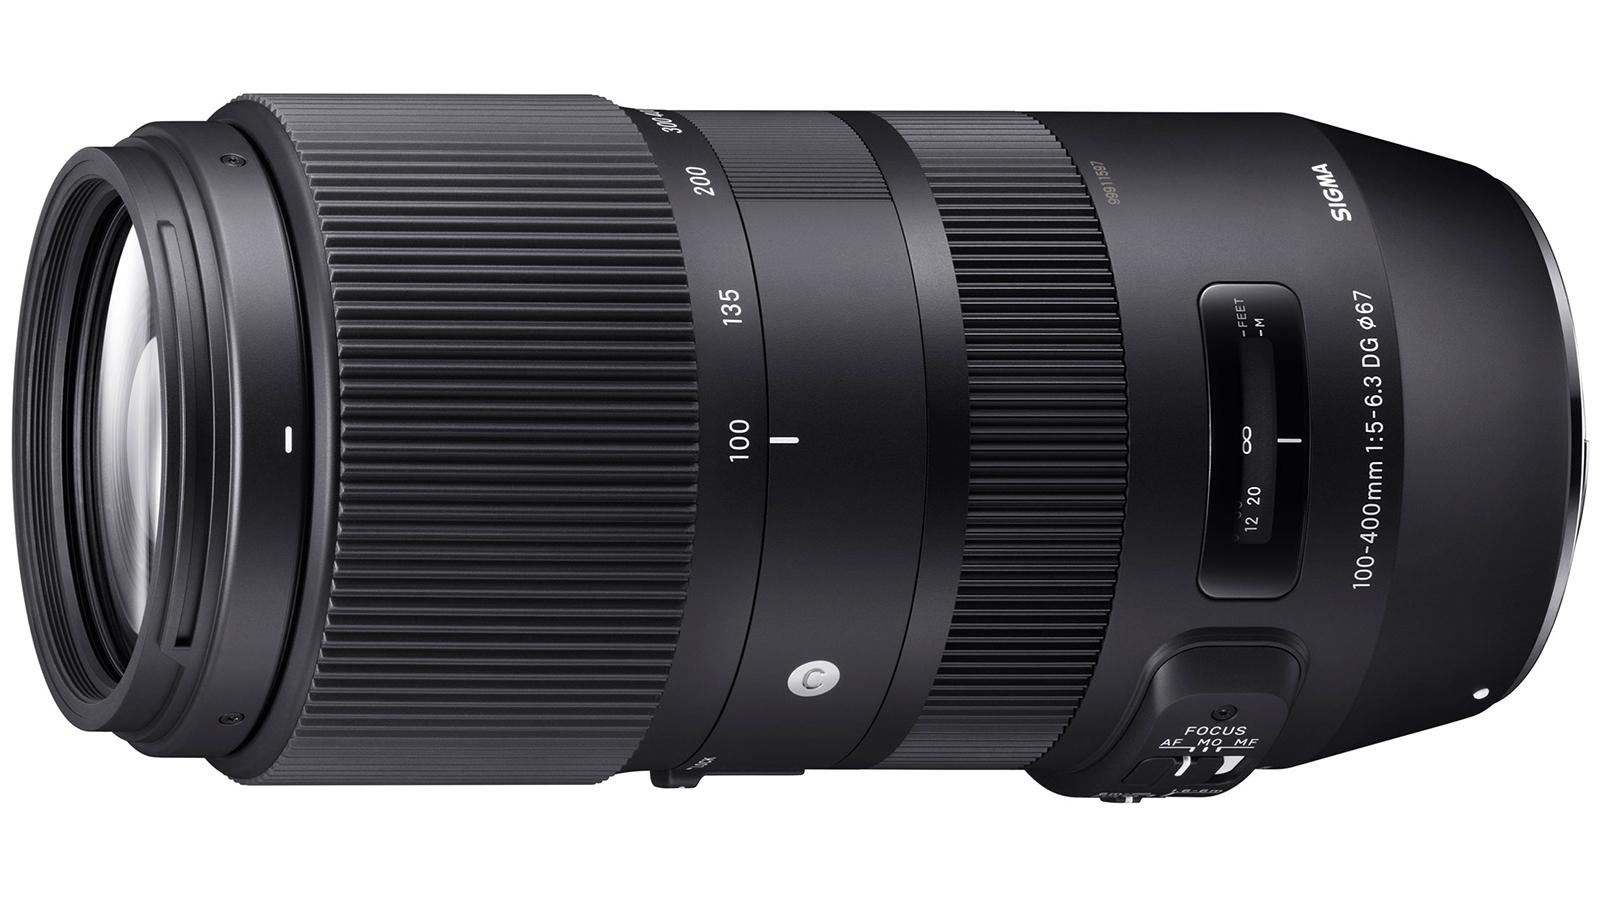 354551574f9 W3 uudised - Canoni bajonetiga Sigma 100-400mm F5-6.3 DG OS HSM  Contemporary objektiiv sai tarkvarauuenduse